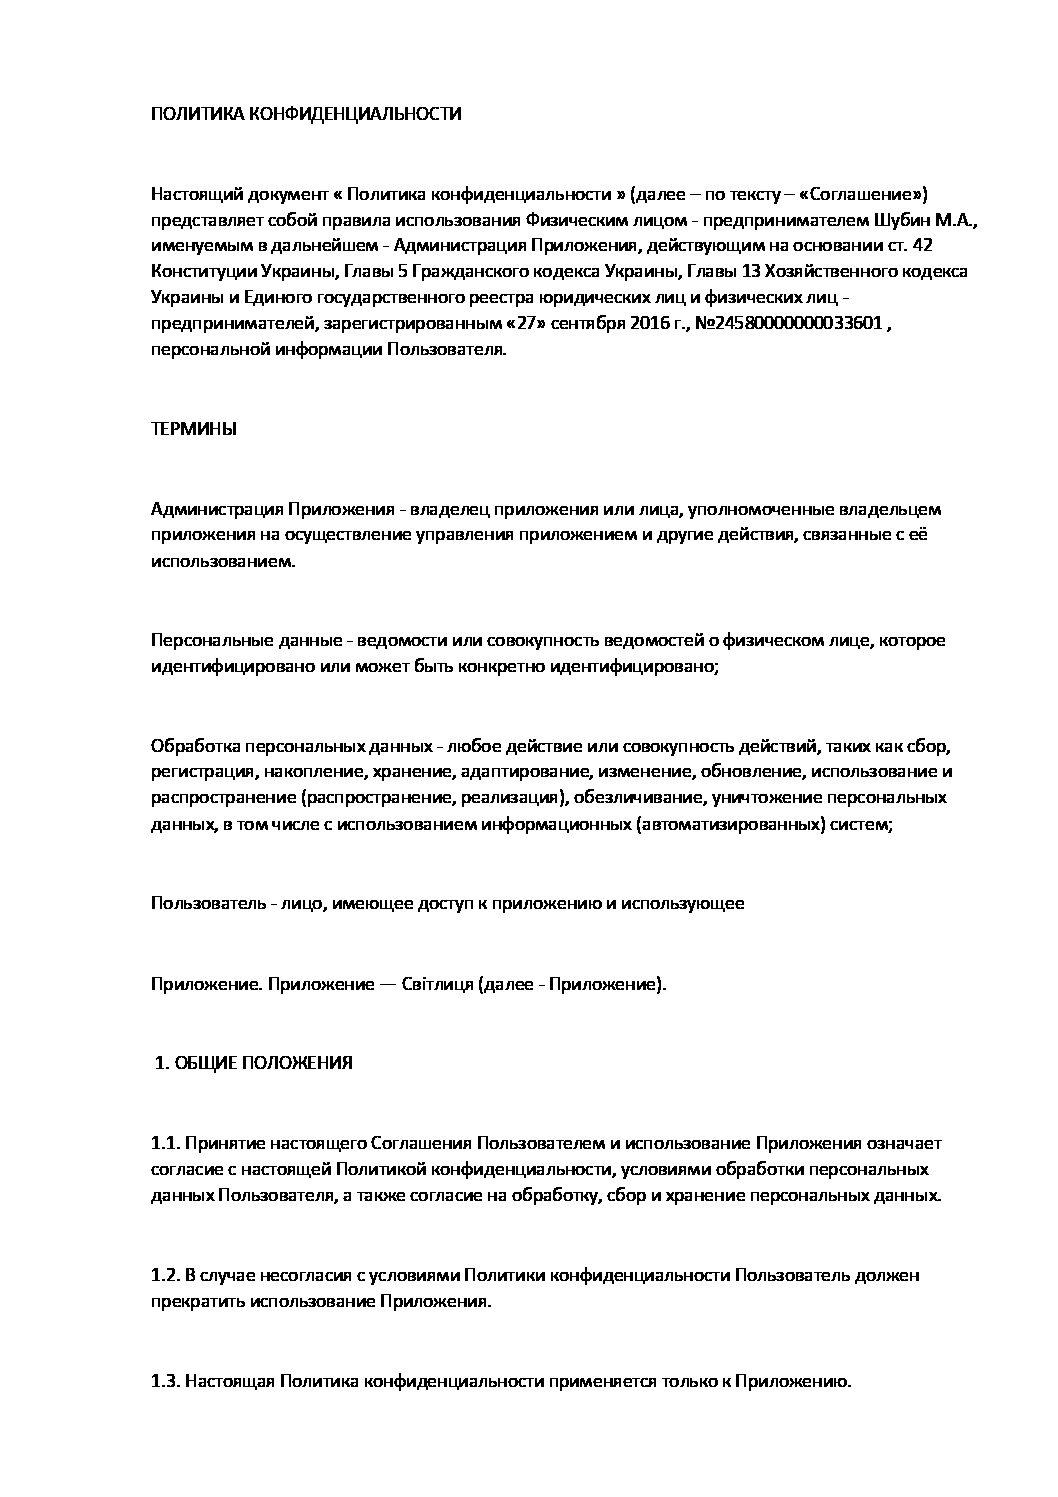 muzei_Shevchenko_police_privacy